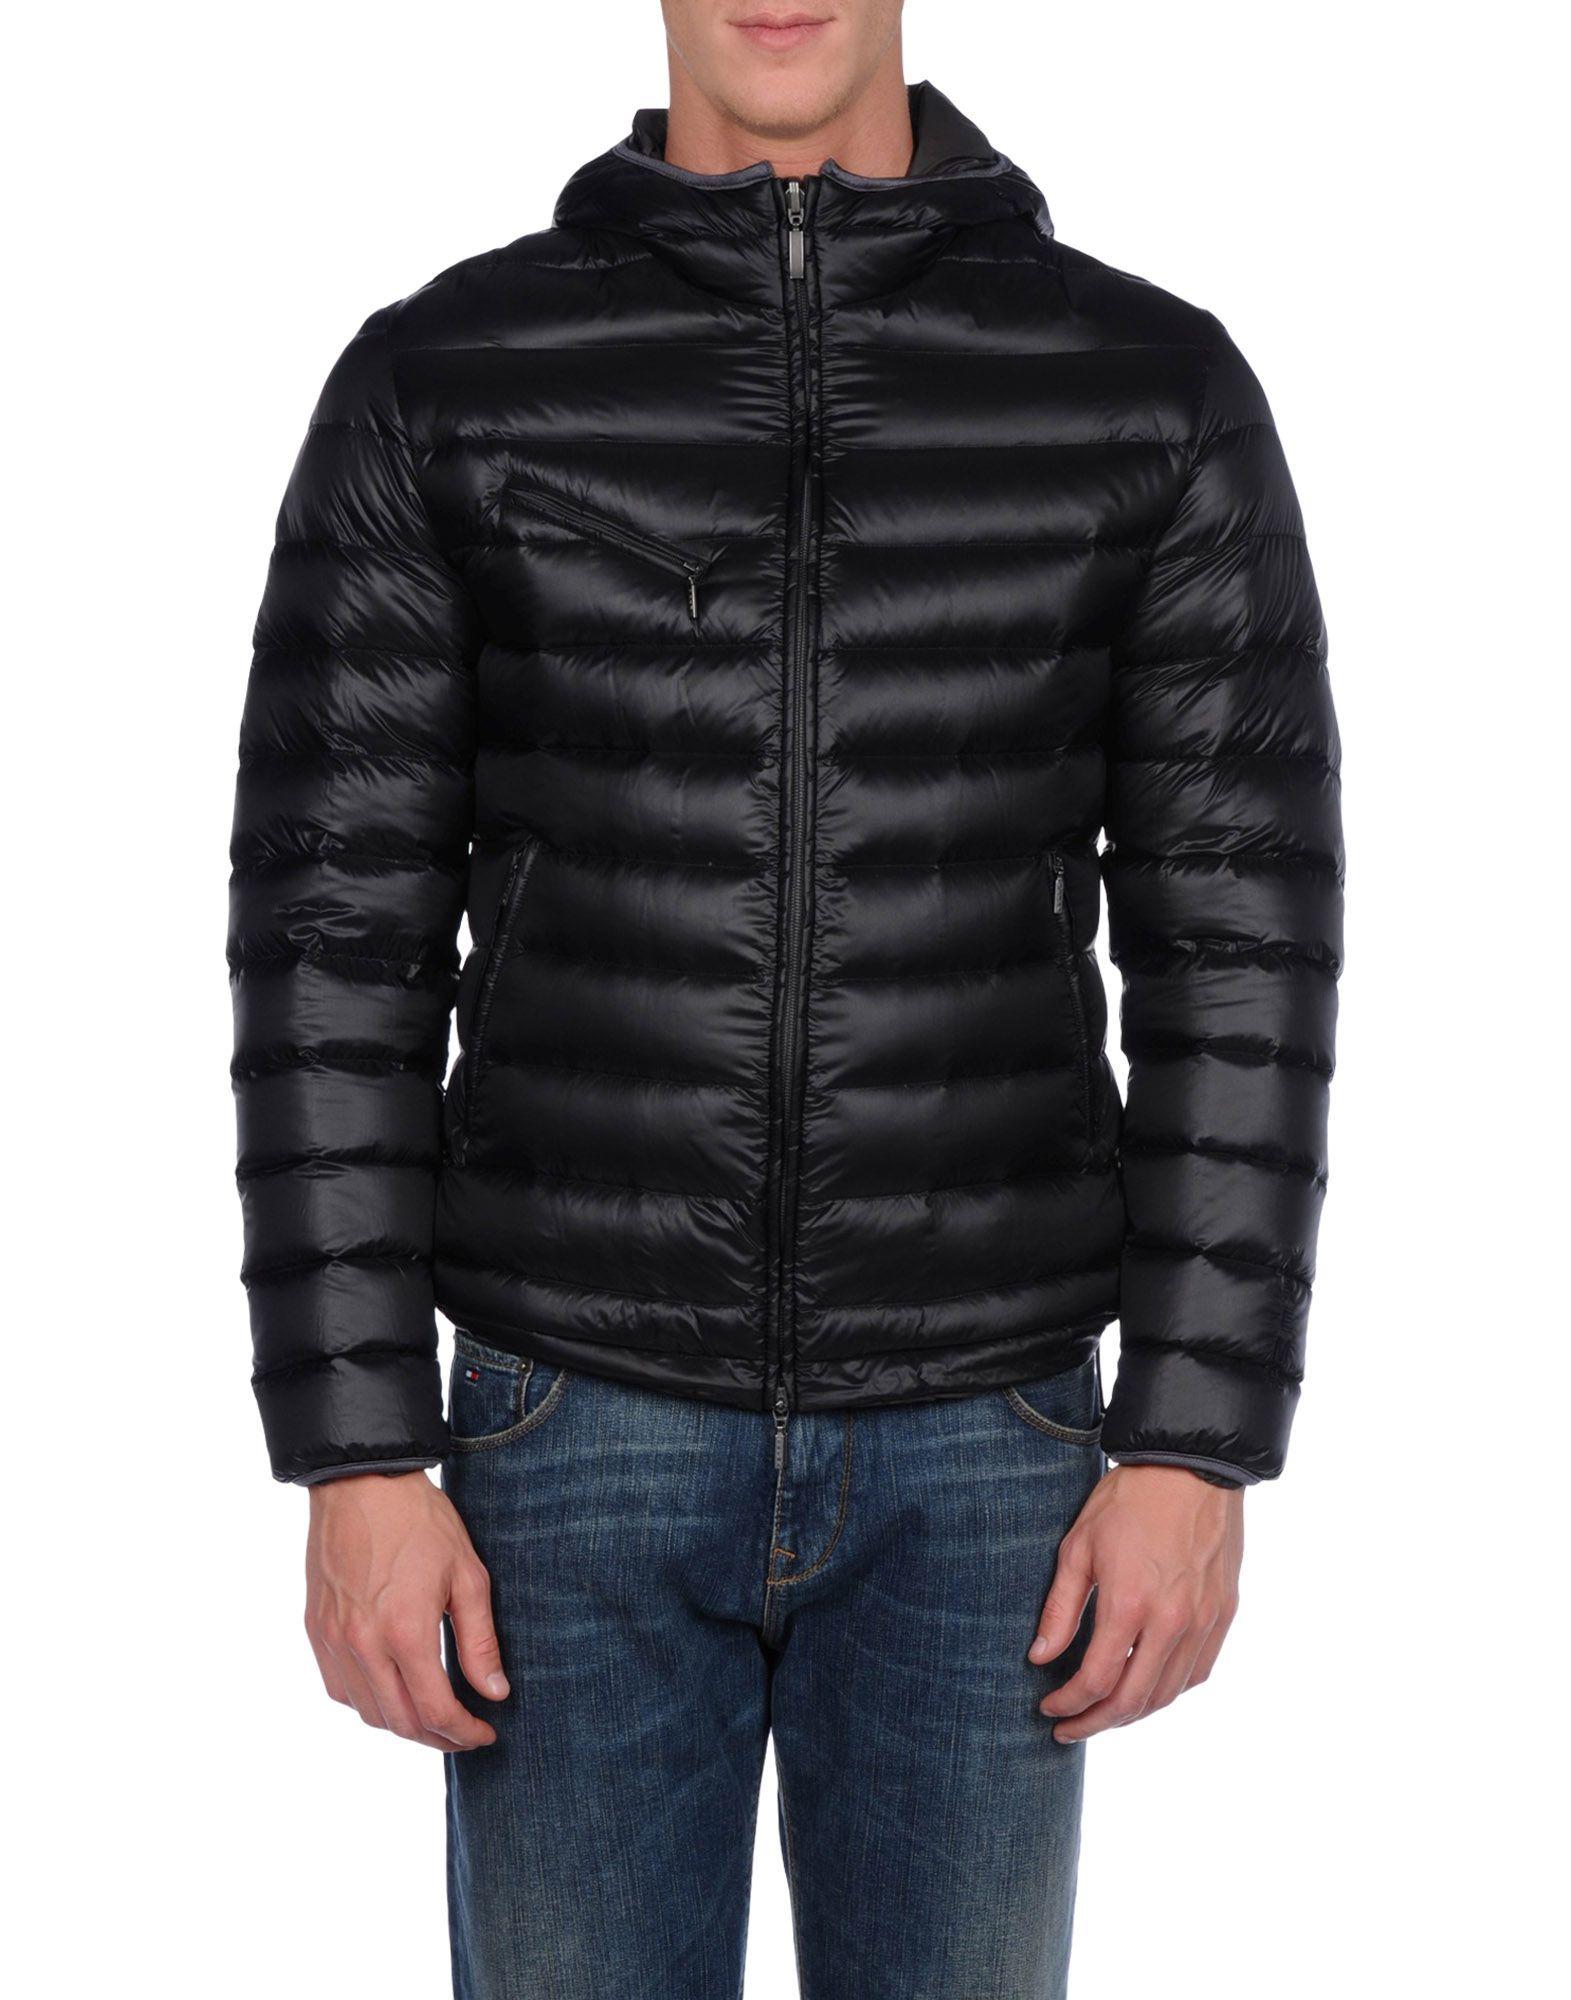 Brema Goose Down Jacket in Black for Men